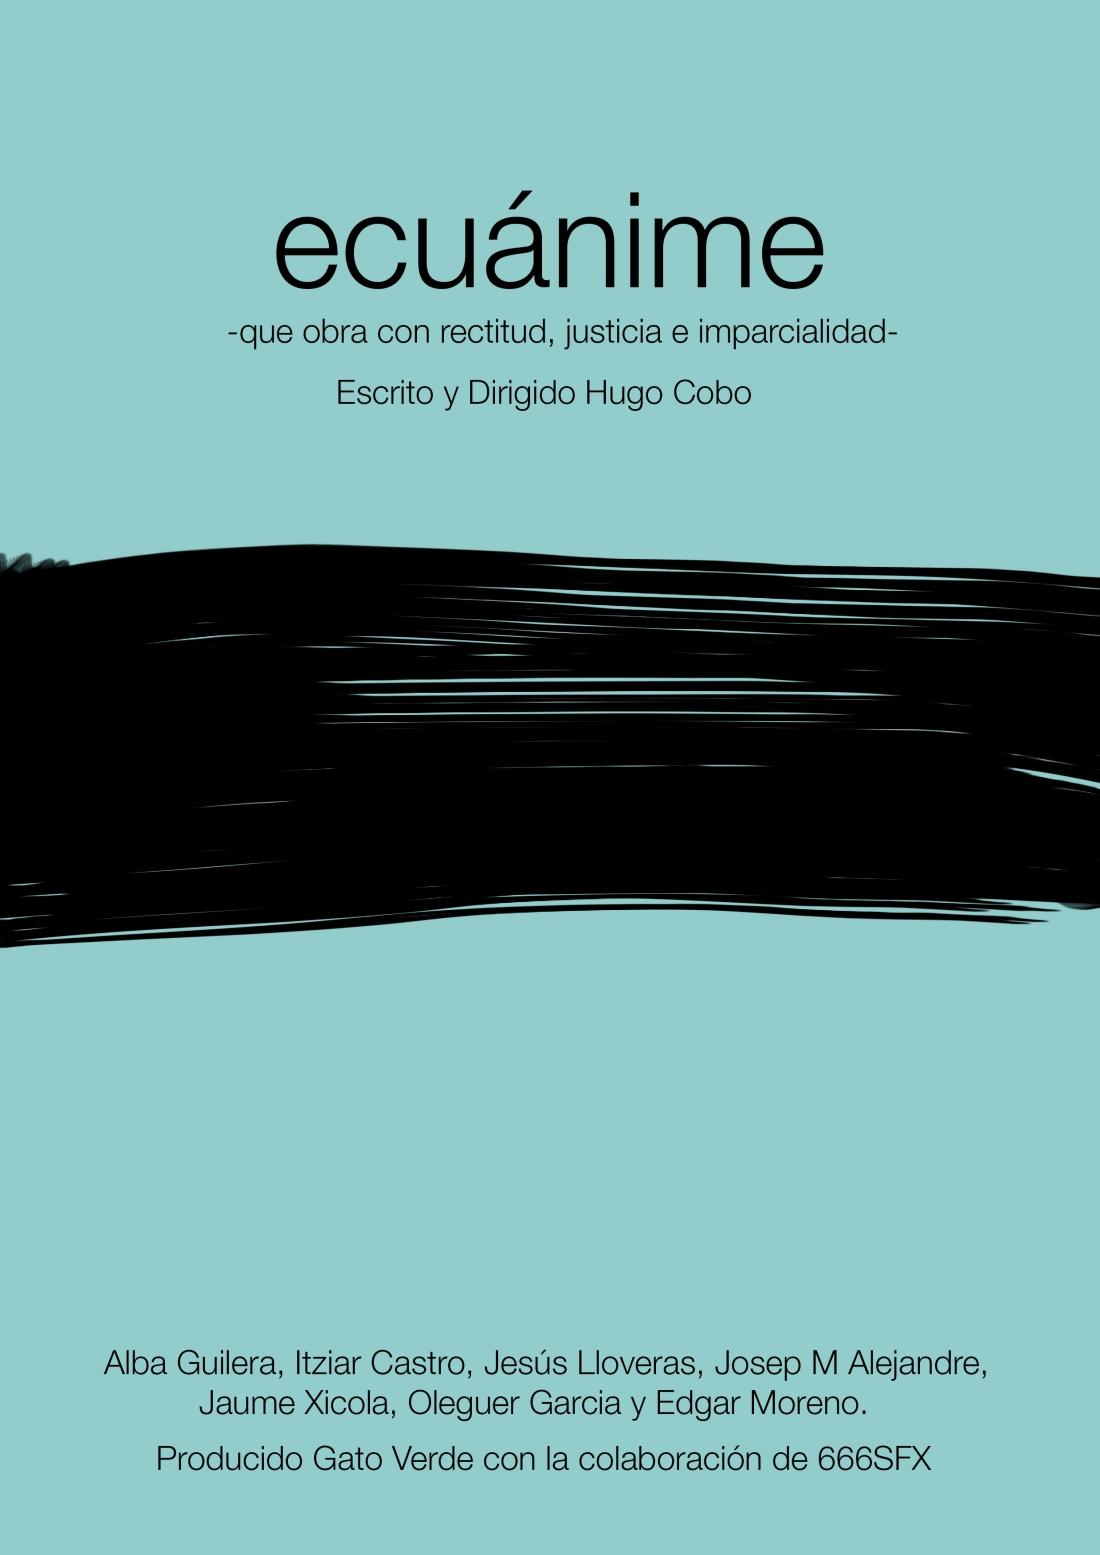 poster ecuánime